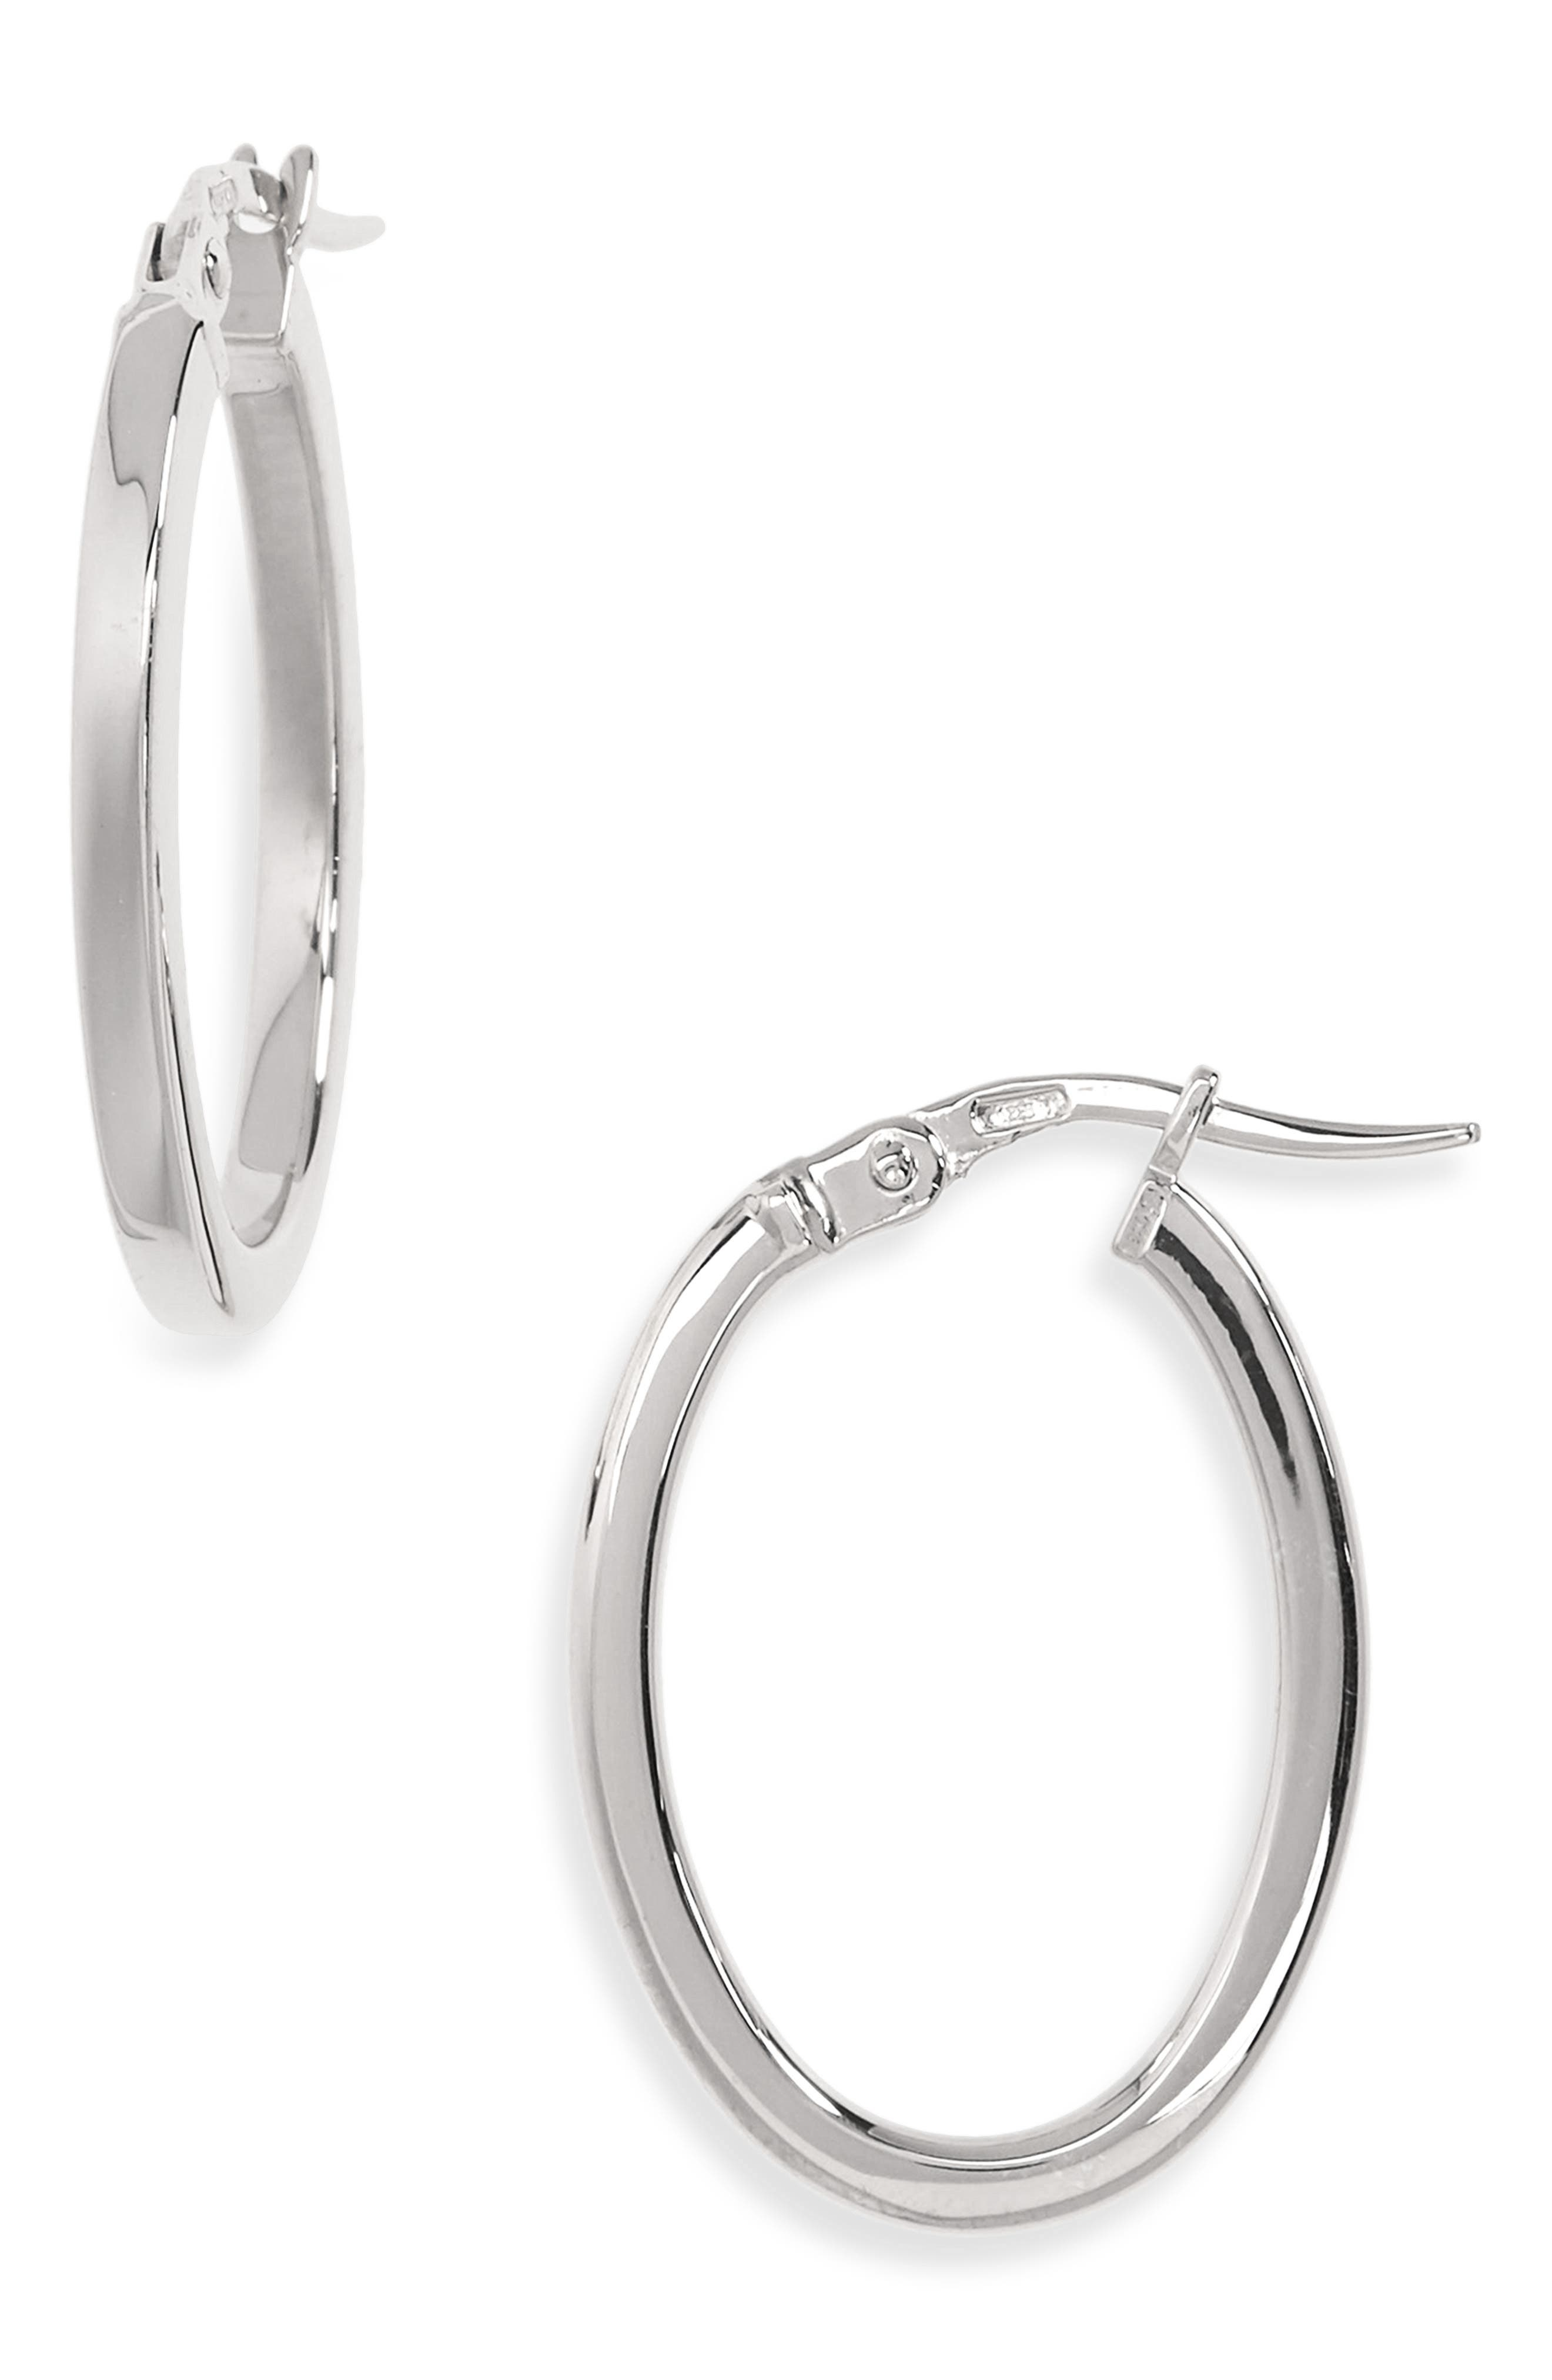 Medium Hoop Earrings,                             Main thumbnail 1, color,                             WHITE GOLD